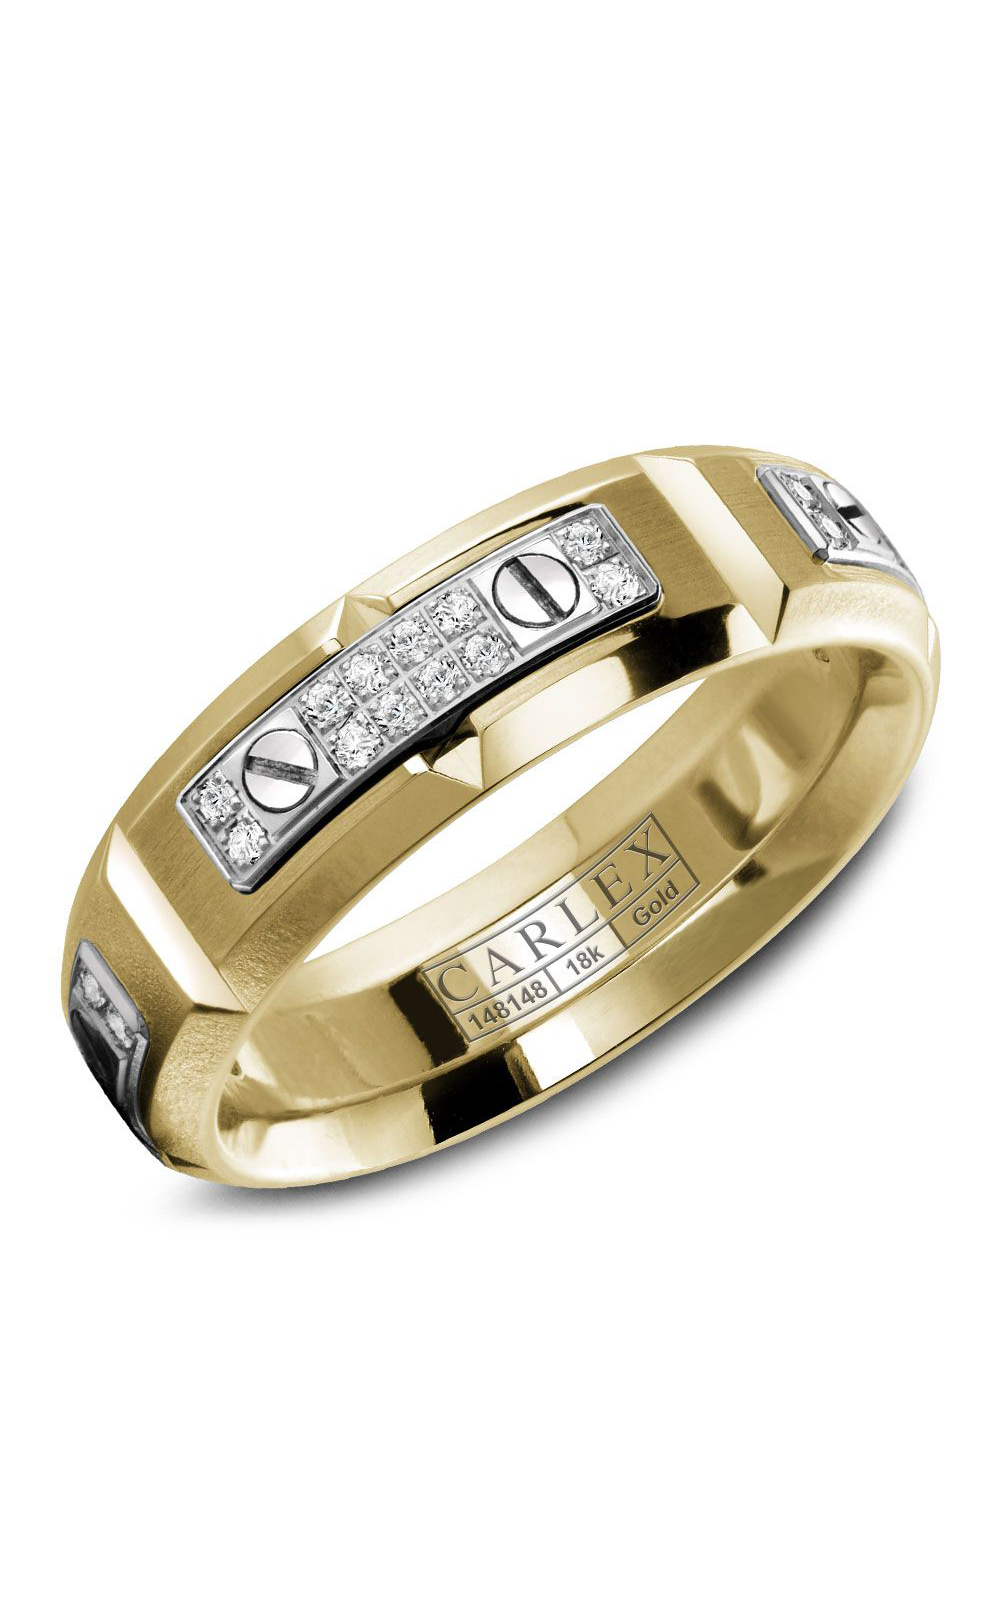 Carlex G2 Men's Wedding Band WB-9587WY product image